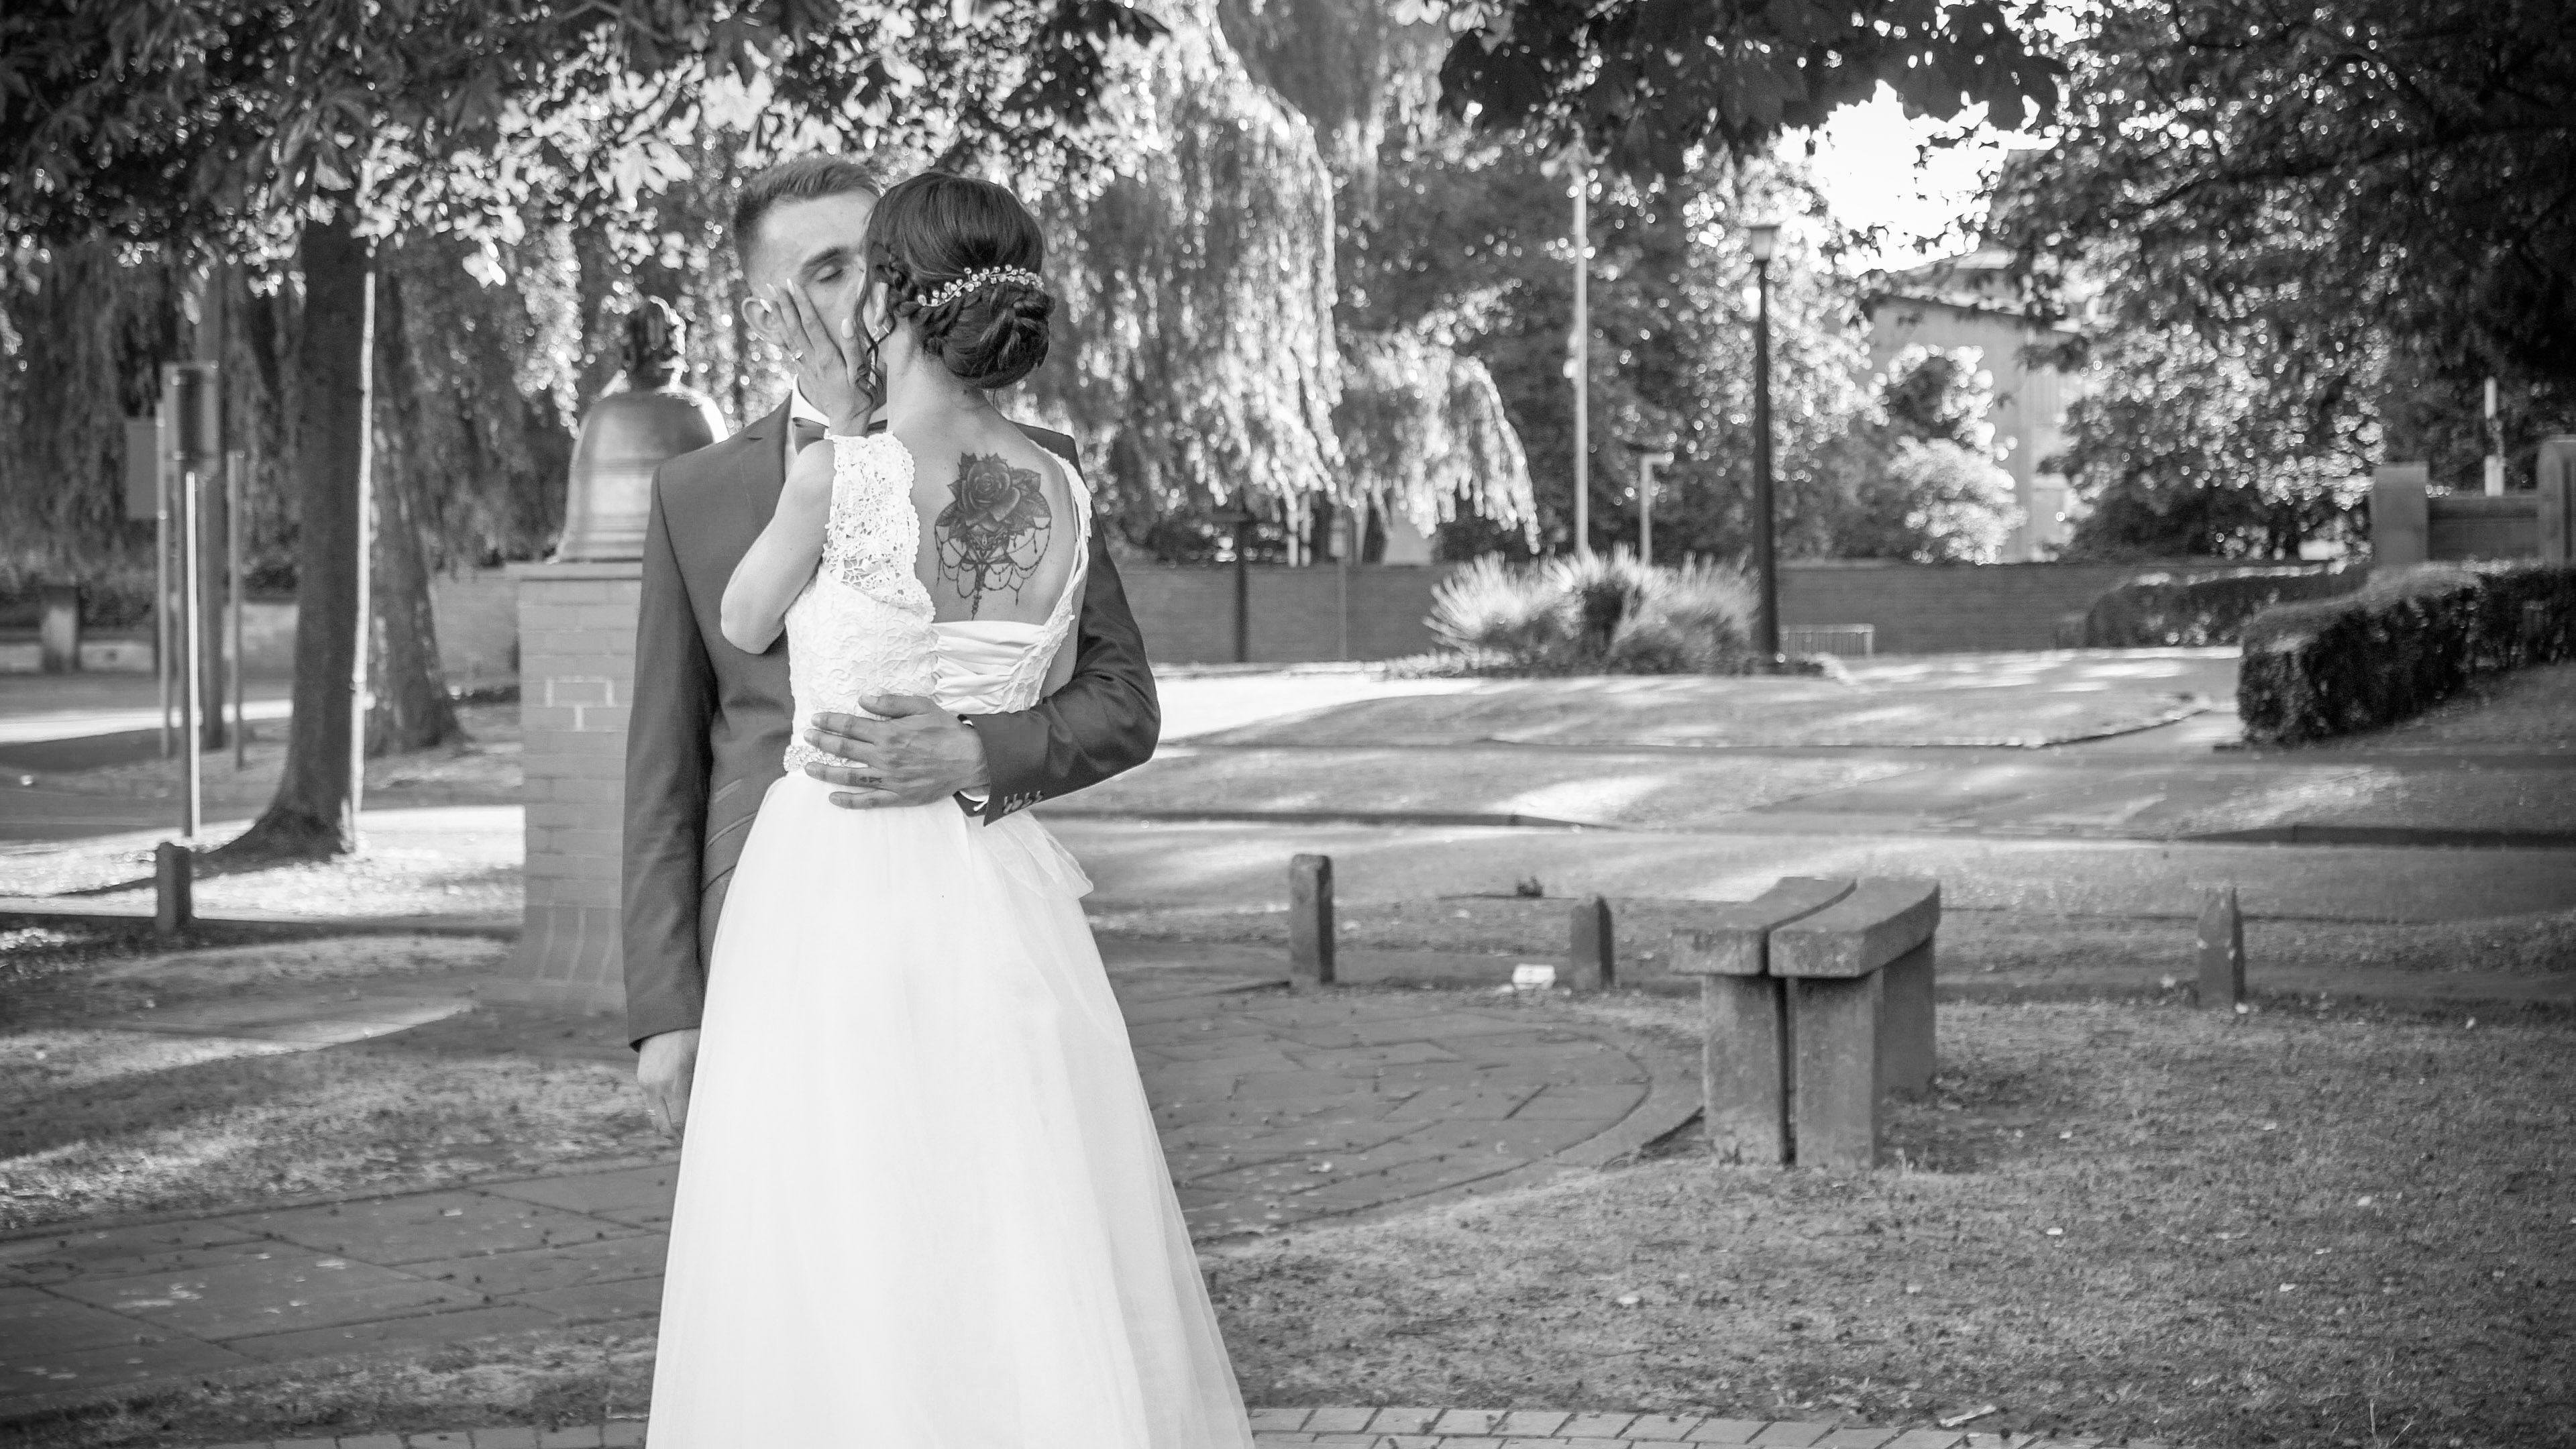 Wedding Videographer Yorkshire Leeds, Huddersfield,York, Wakefield ...